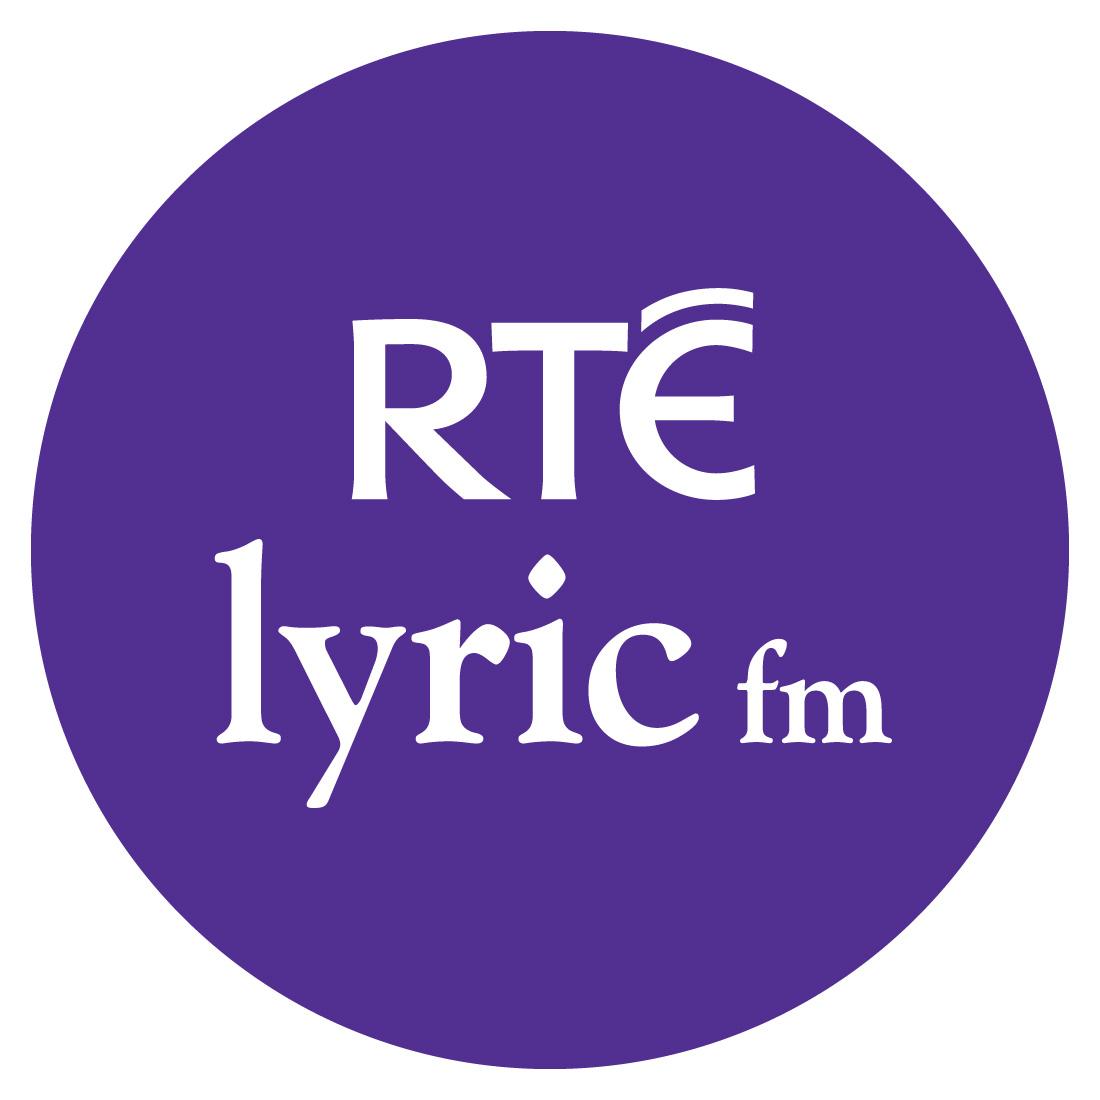 RTÉ lyric fm / IMRO Mentored Composition Bursary